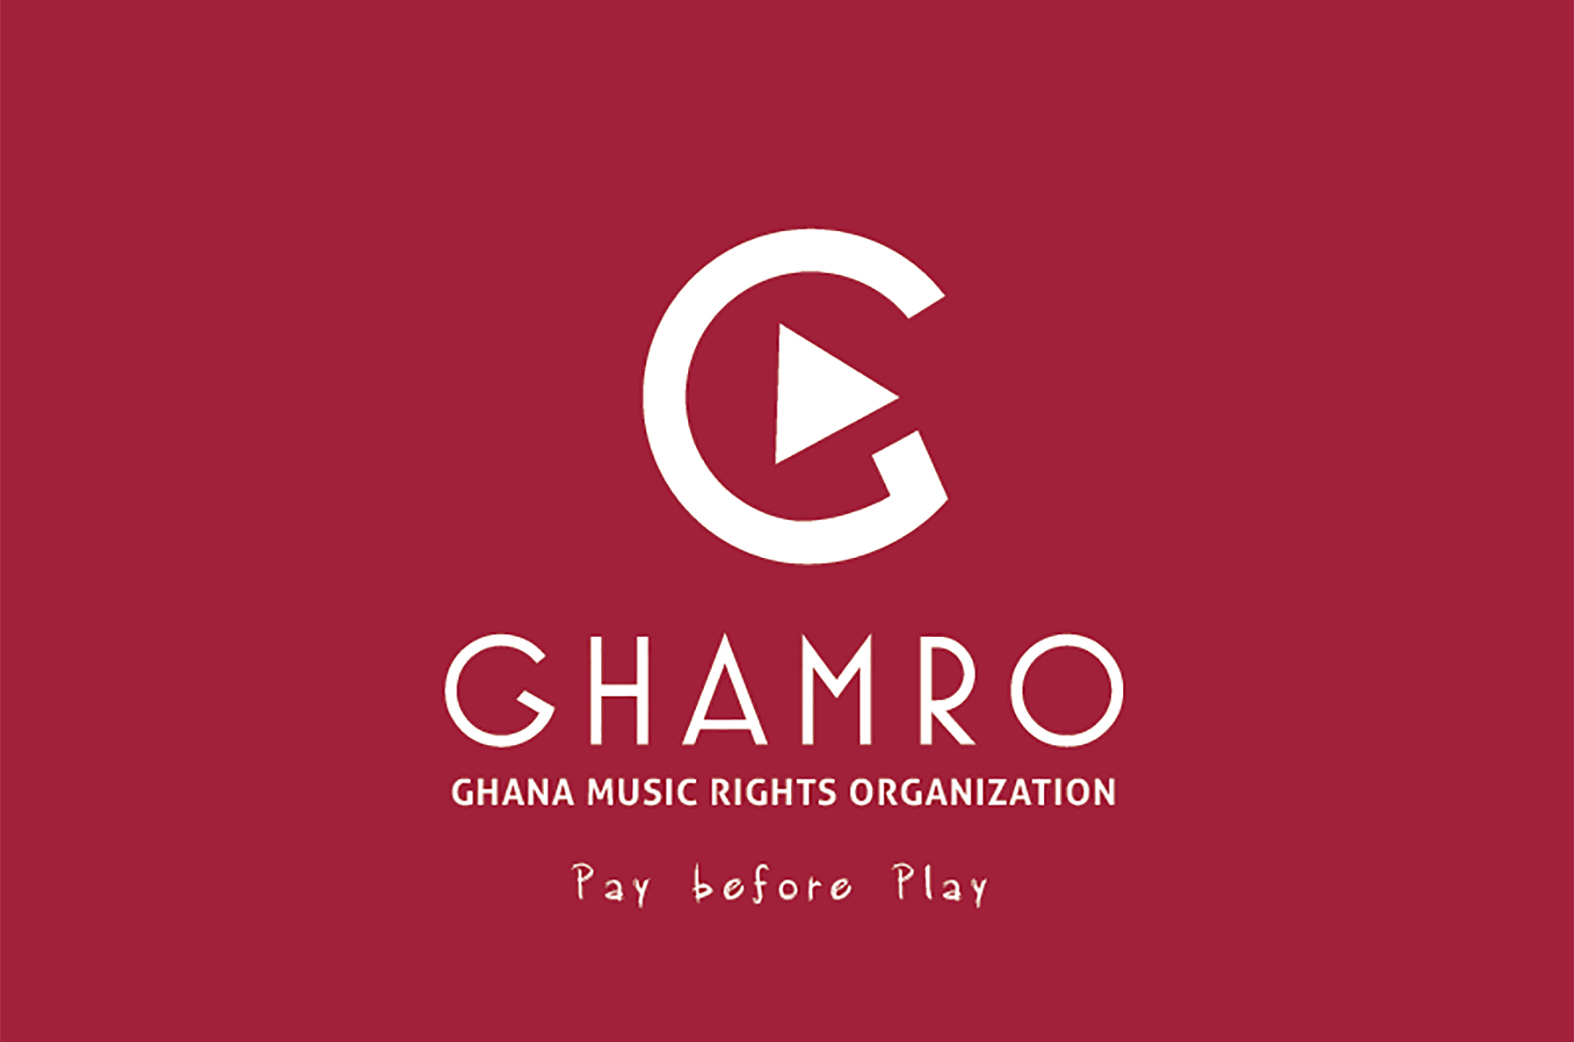 GHAMRO